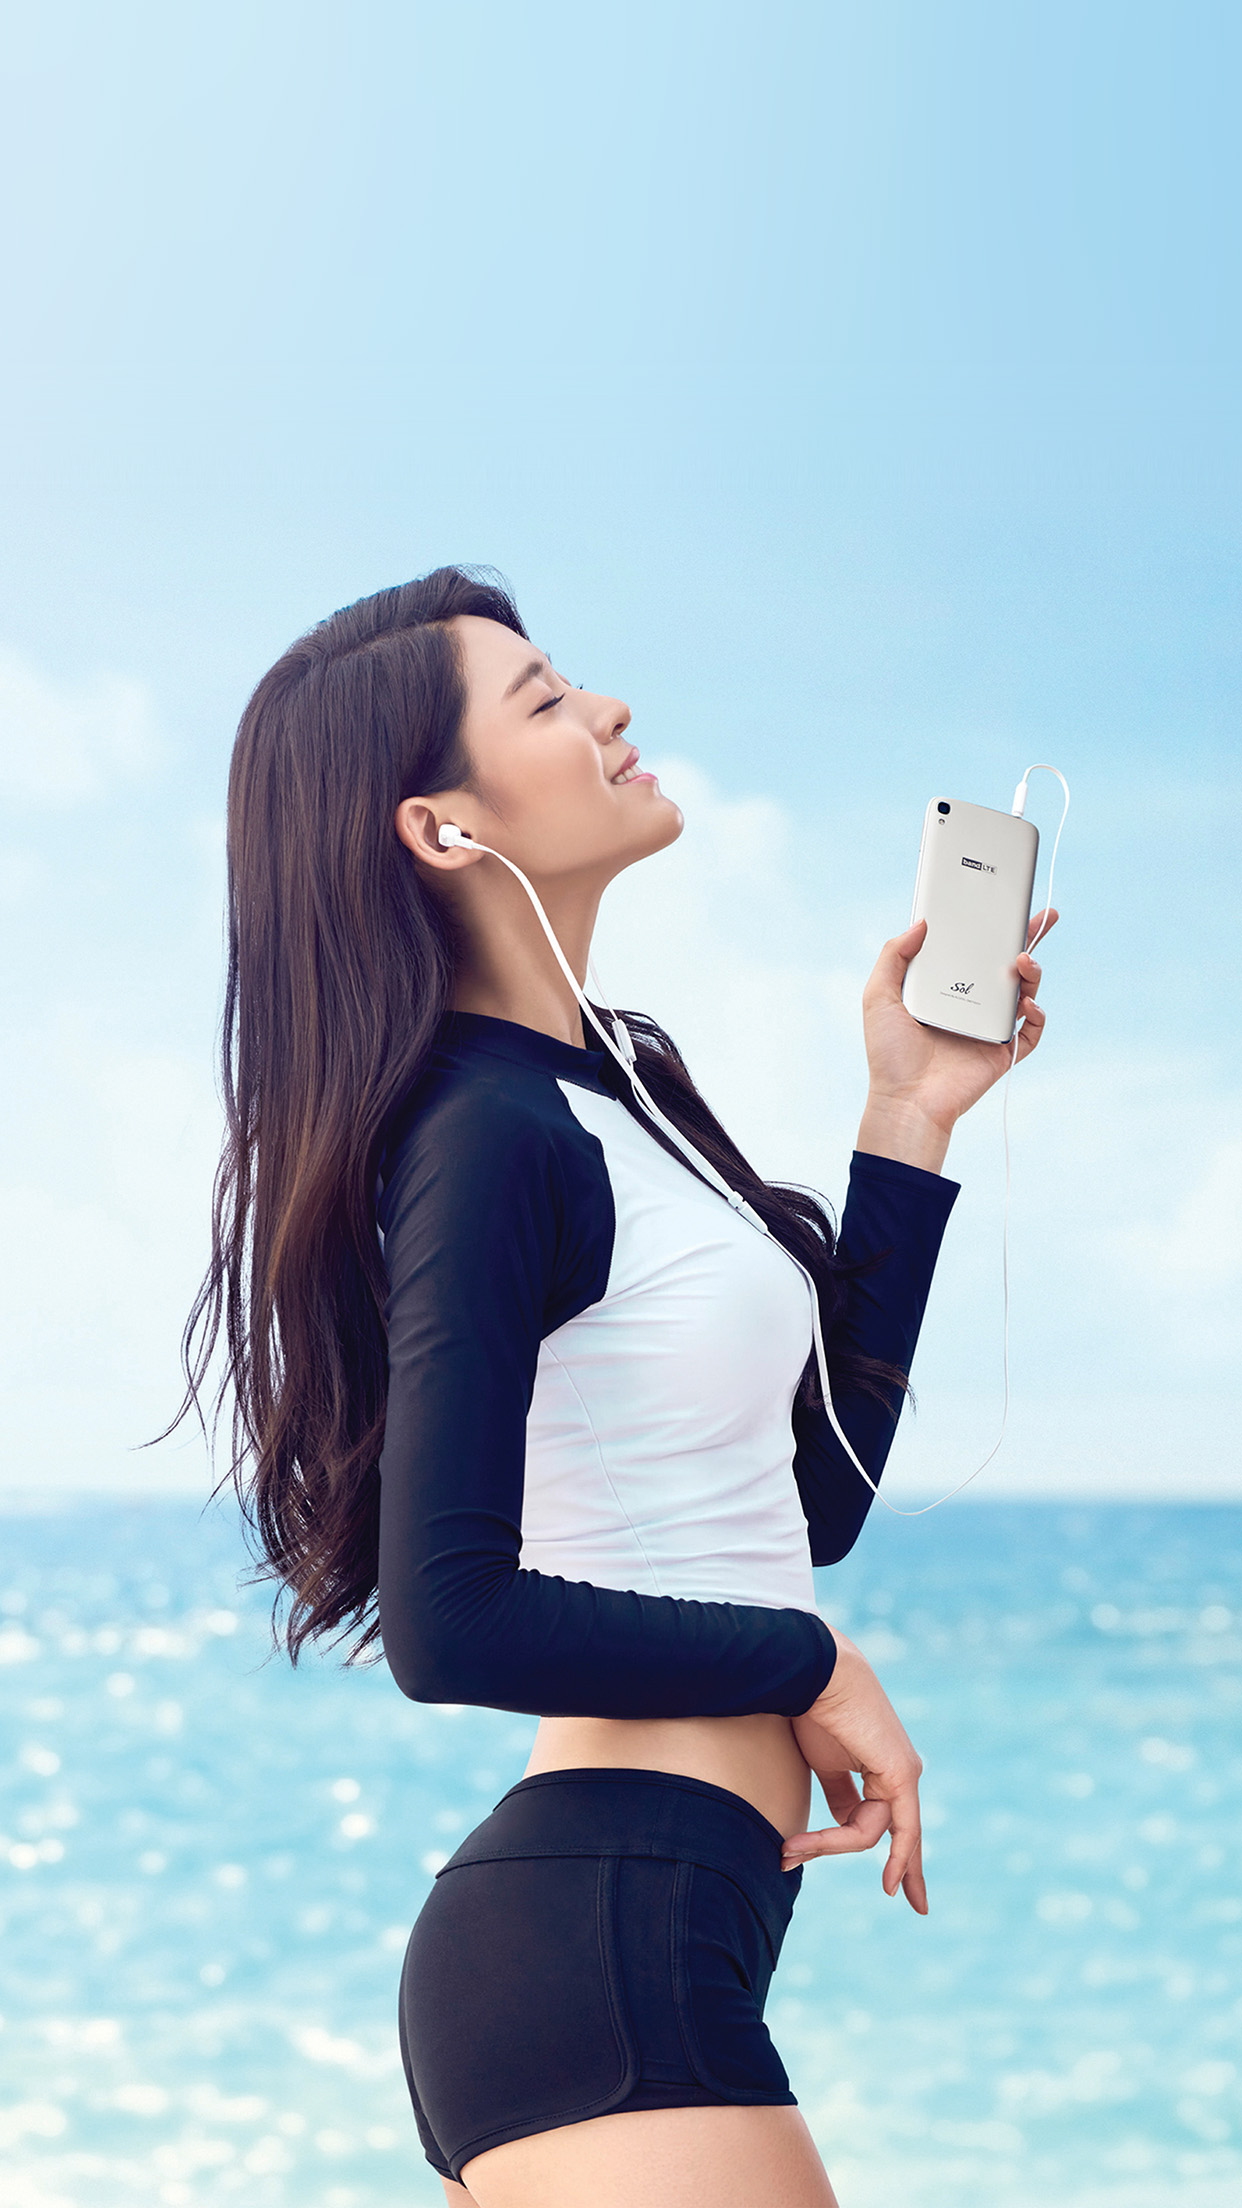 Iphone7papers Hh28 Seolhyun Aoa Kpop Sea Sumner Cute